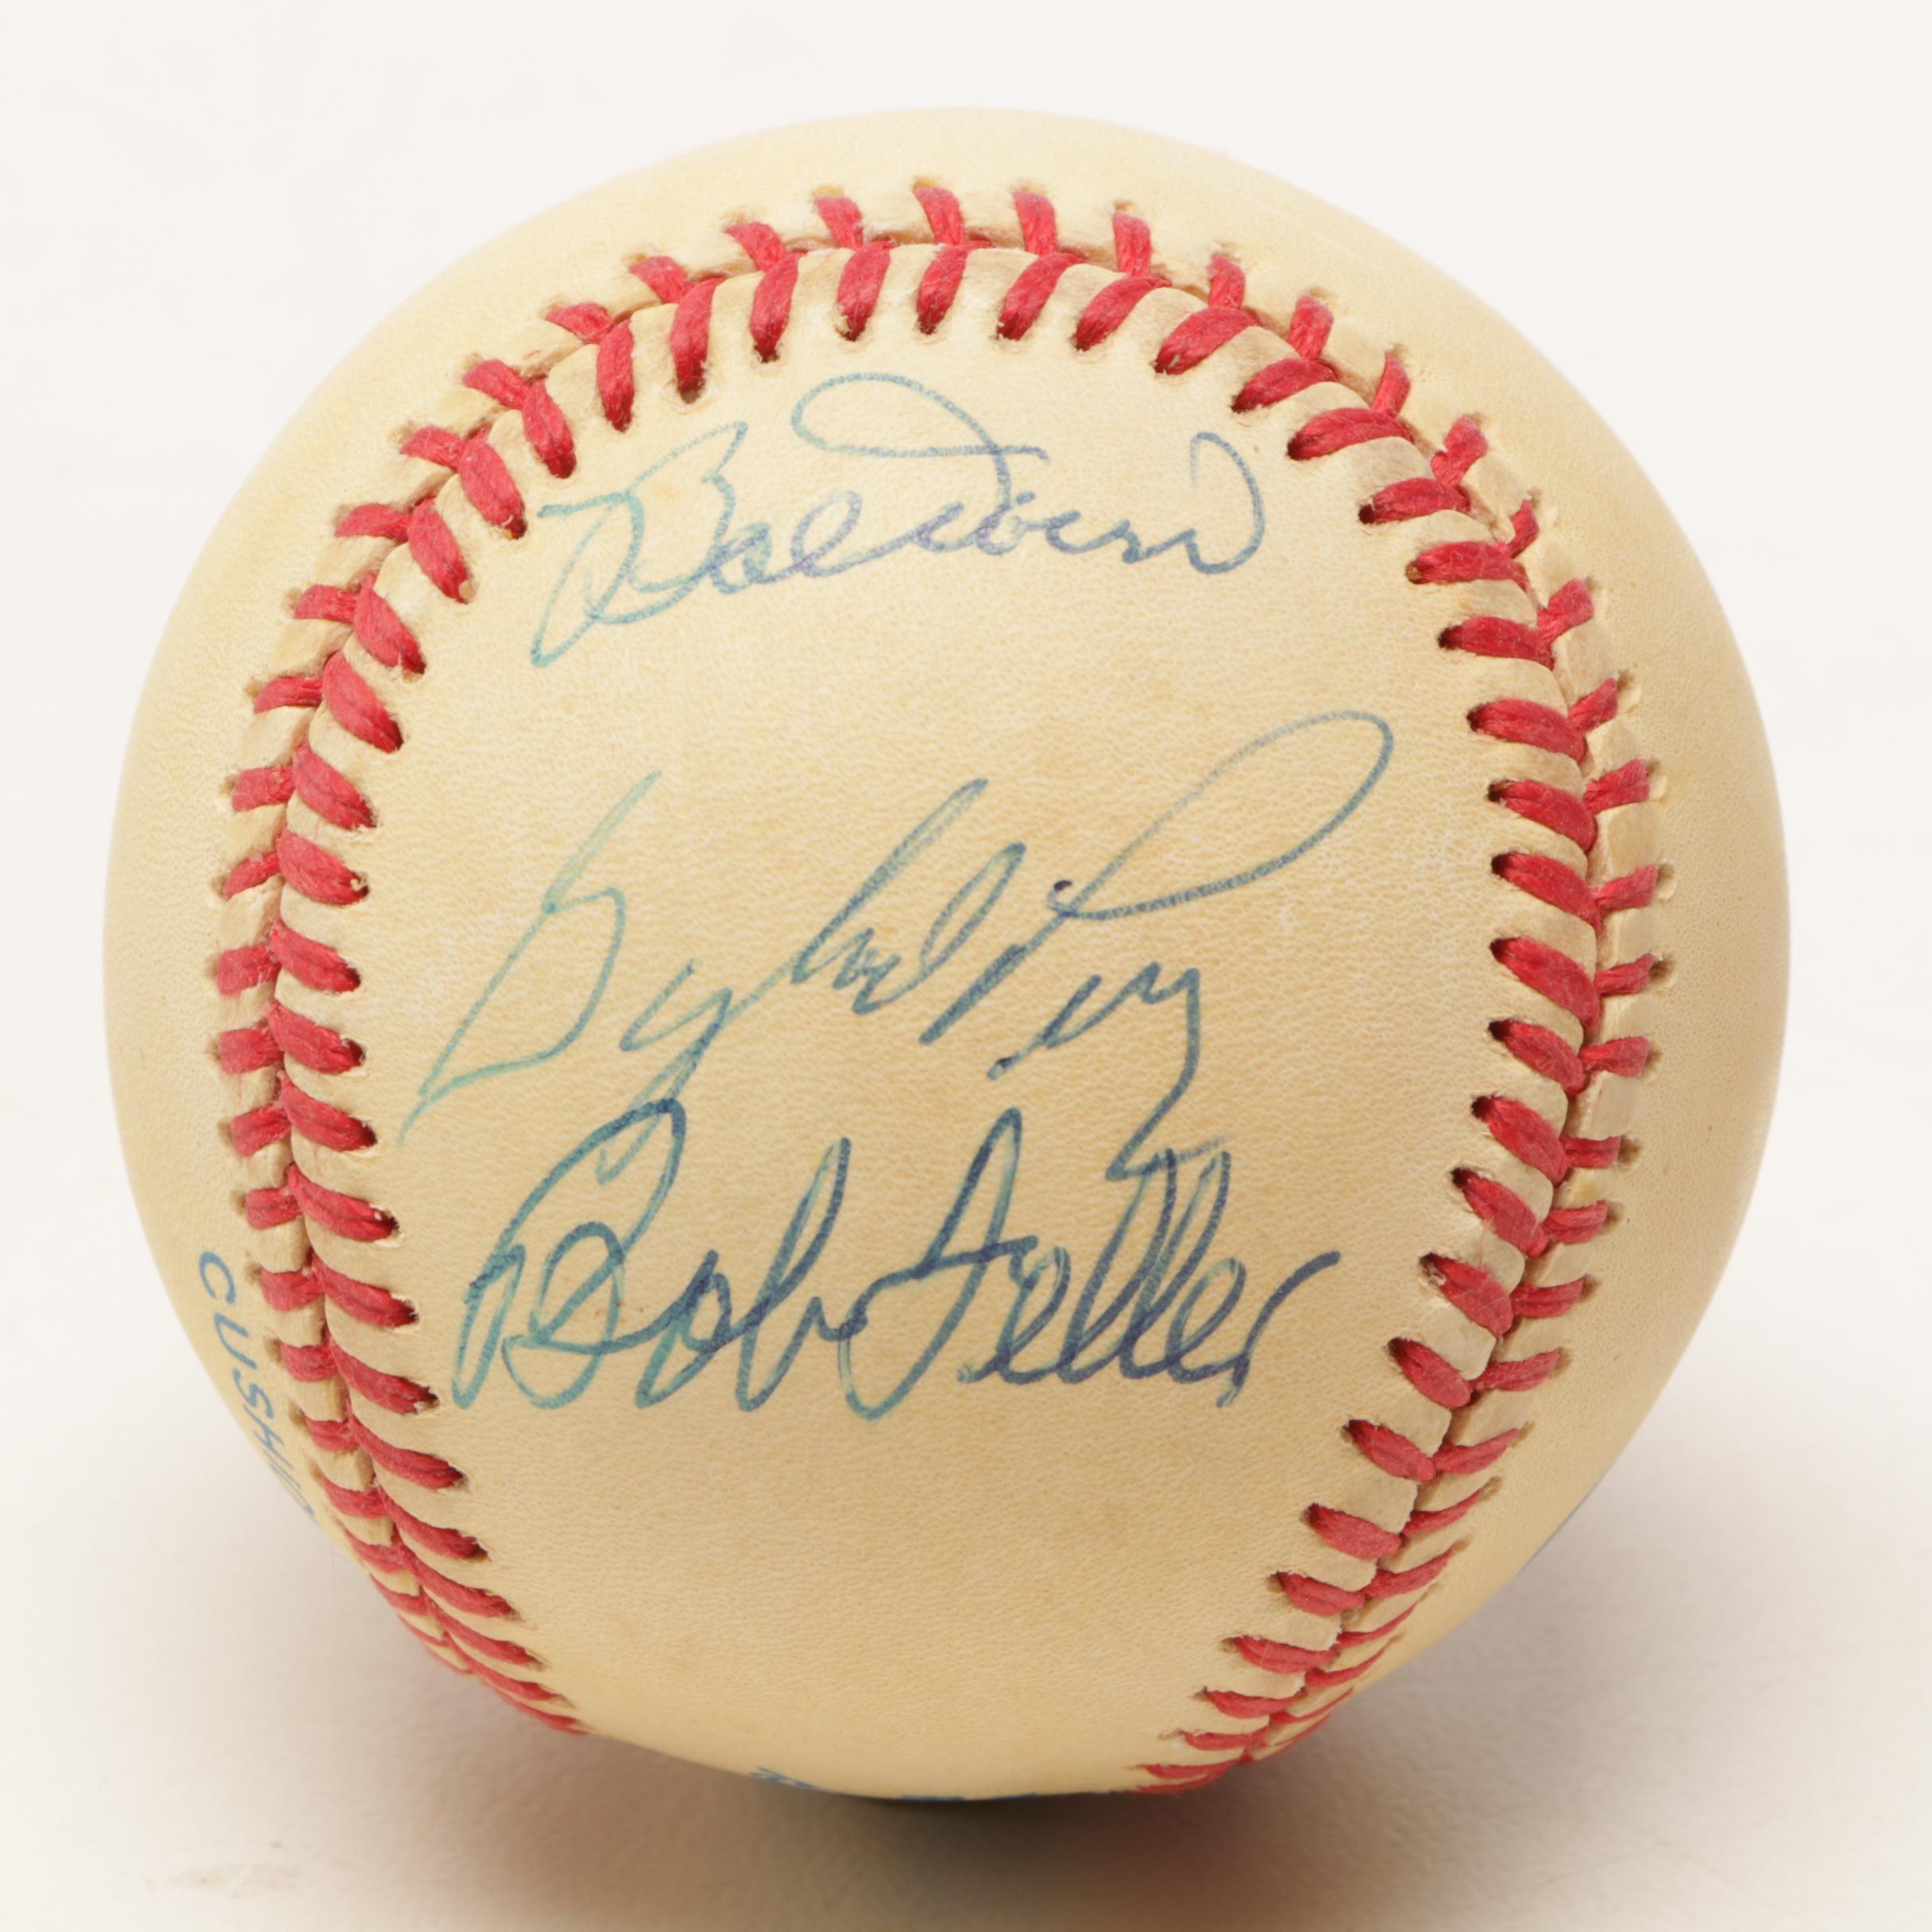 Doerr, Perry, and Feller Signed Rawlings American League Baseball